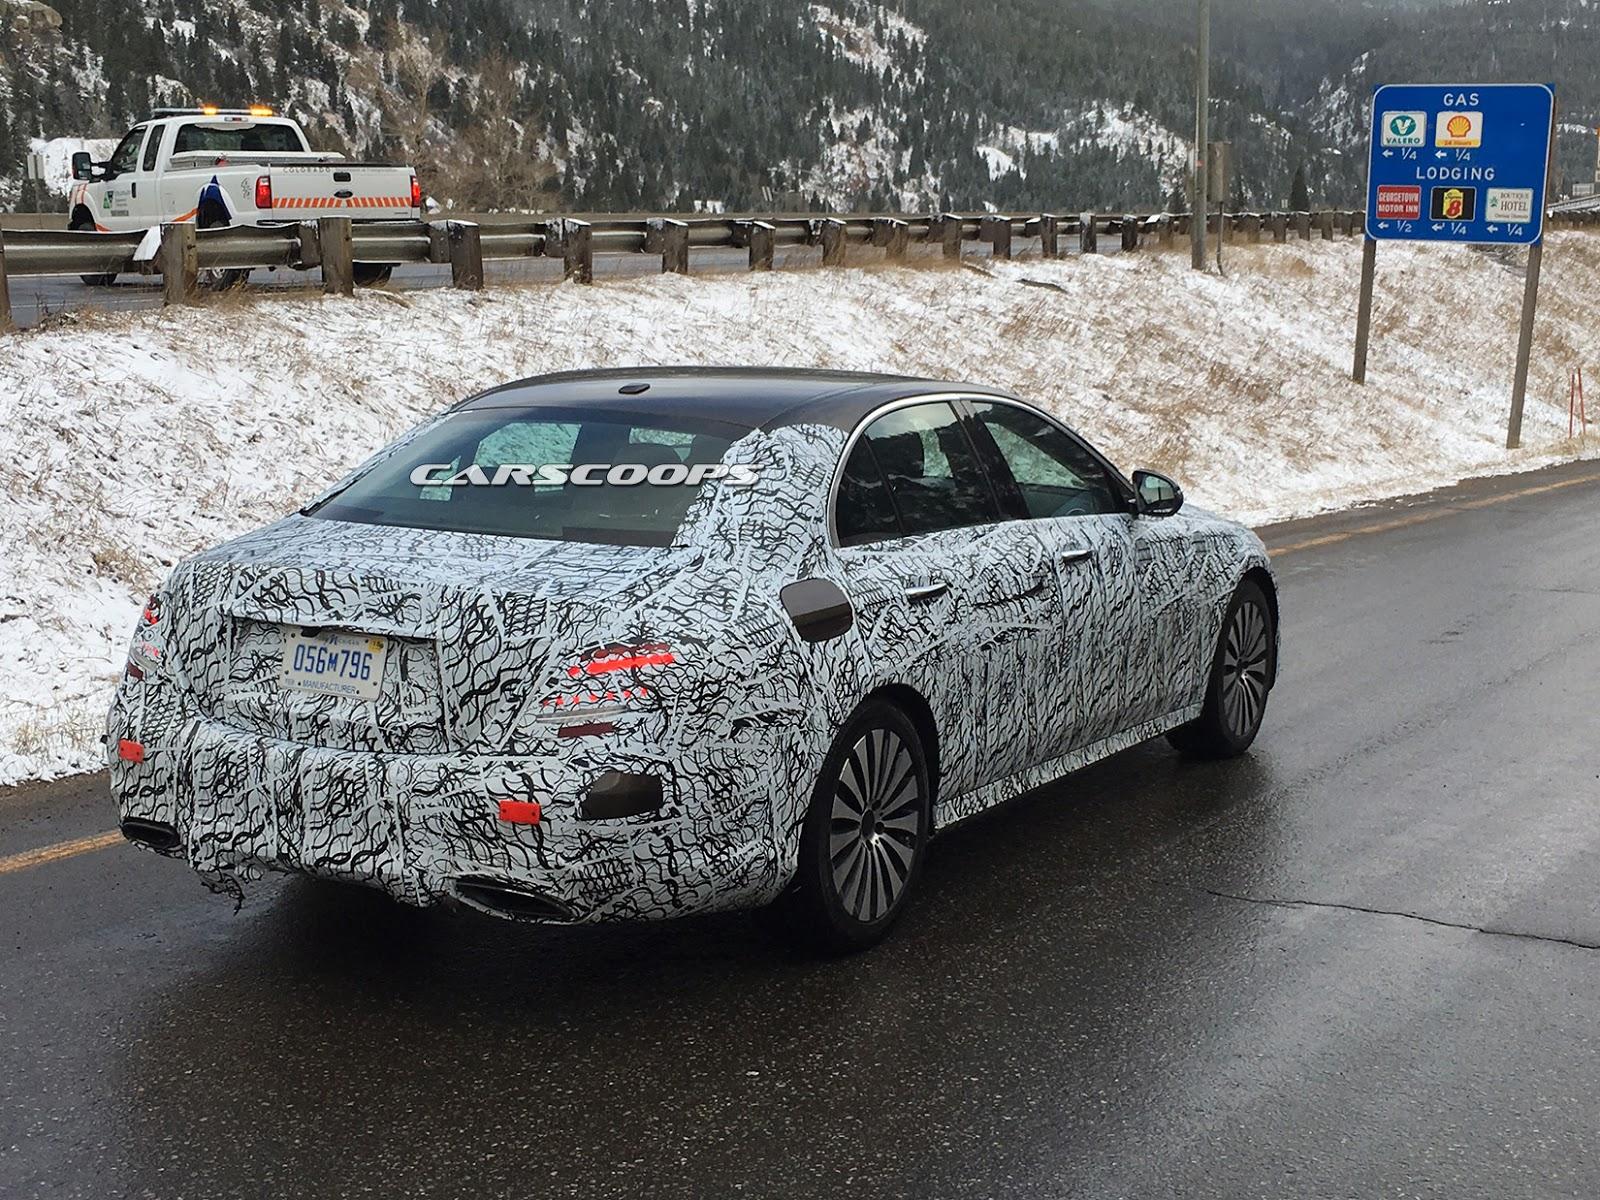 Mercedes benz of denver jobs fiat world test drive for How to get a job at mercedes benz